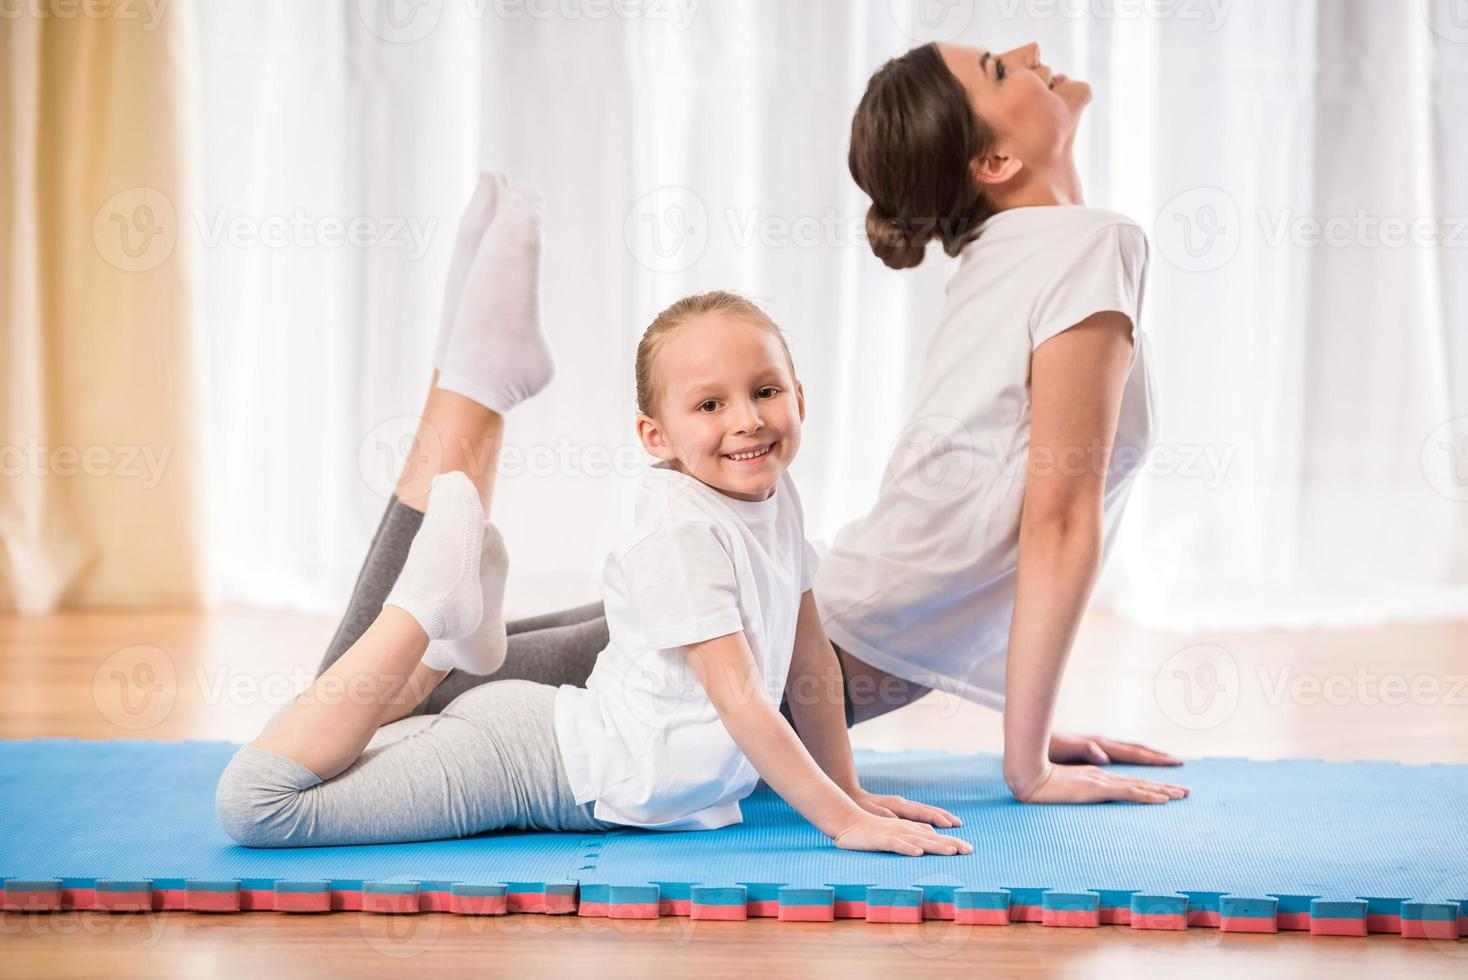 yoga em casa foto